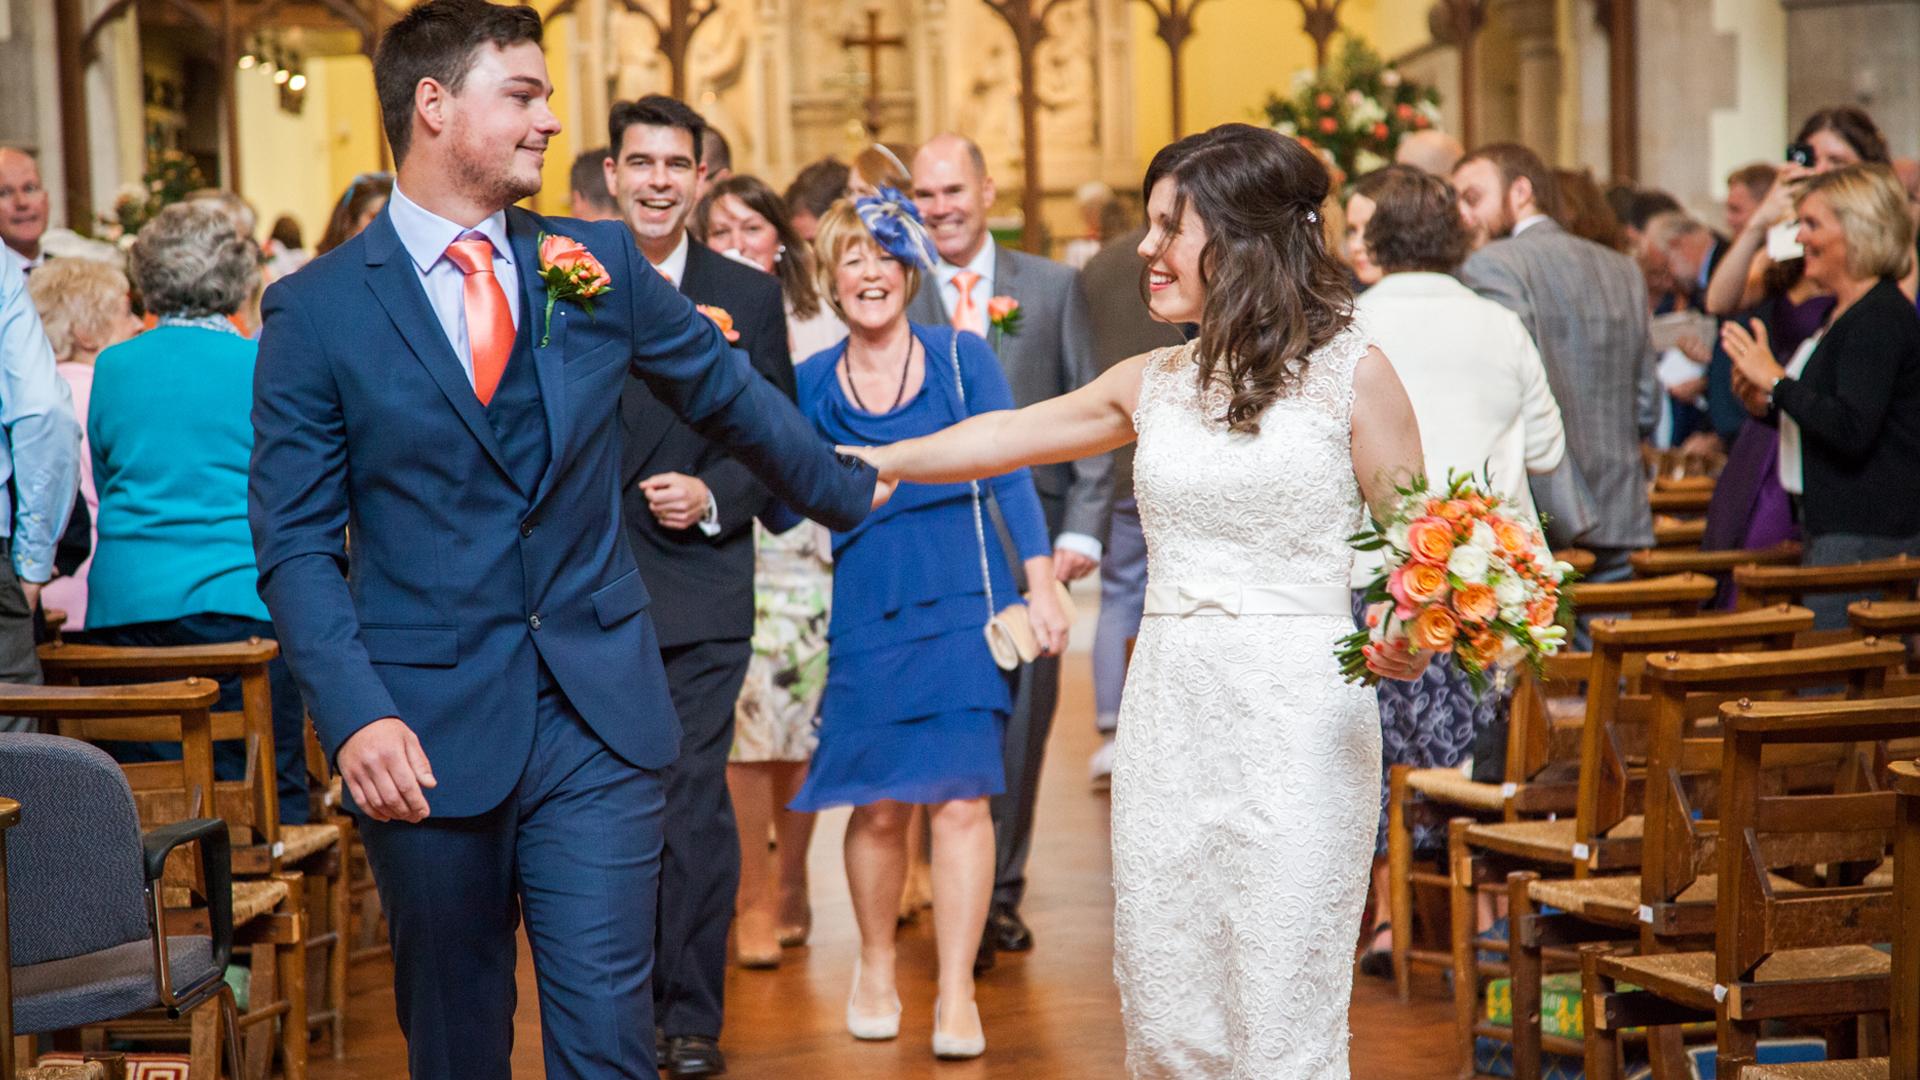 sussex wedding photographer, brighton wedding photographer, wedding photography at stanmer house